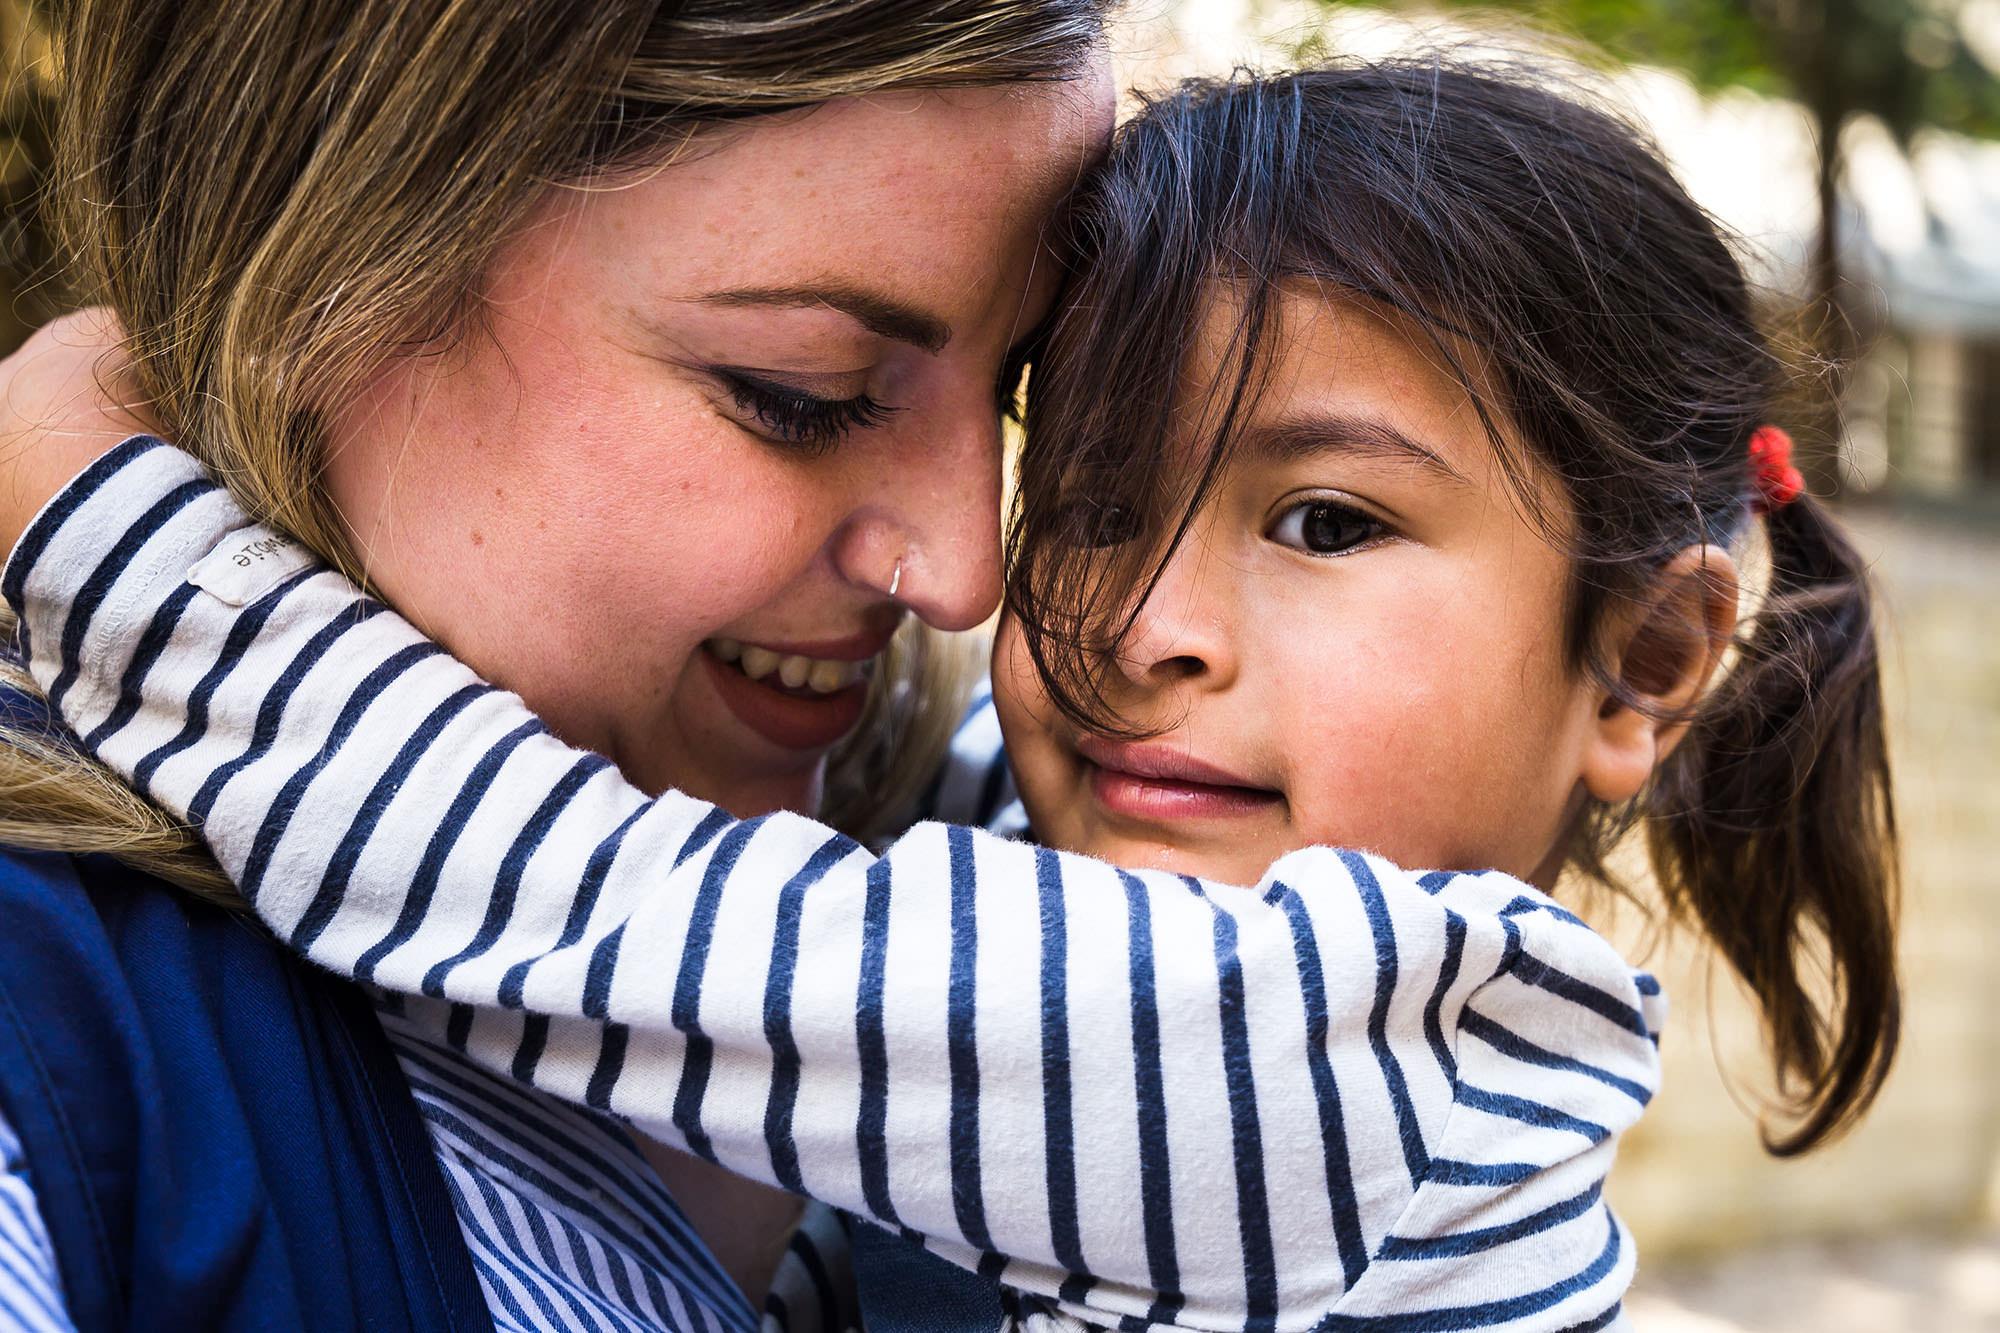 Greece Ioannina refugees kids